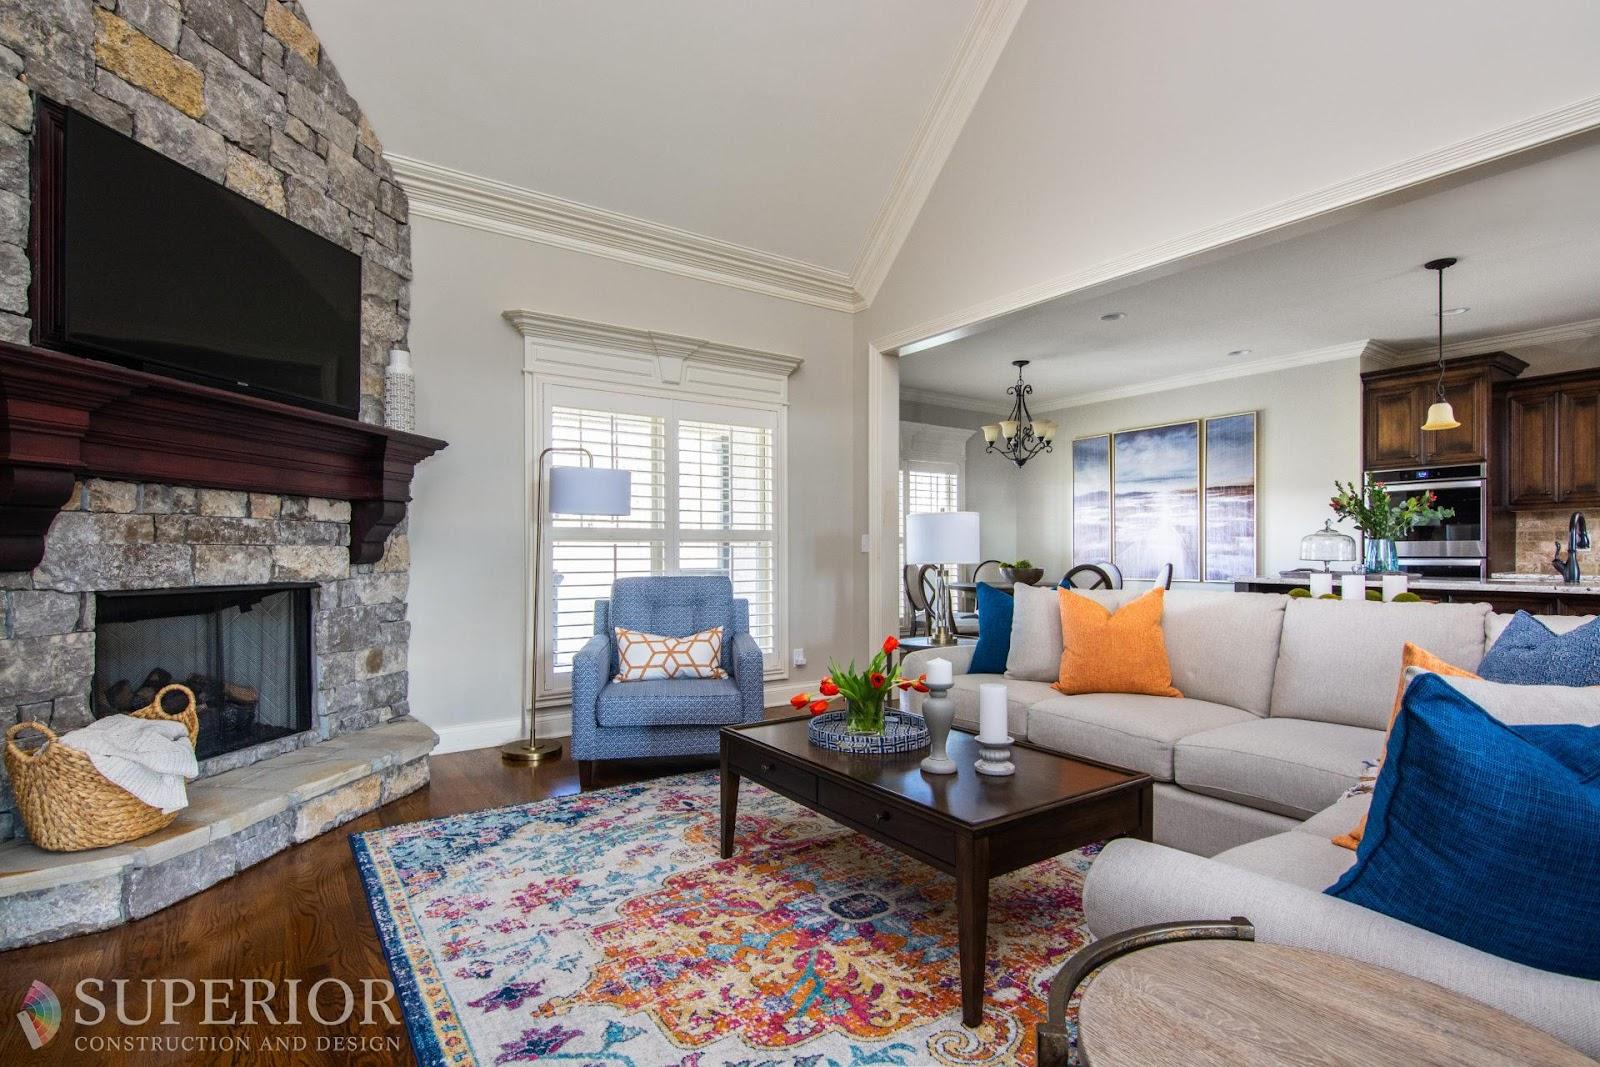 decorated living room tn orange blue cream furnishings sofa chairs pillows decor budget